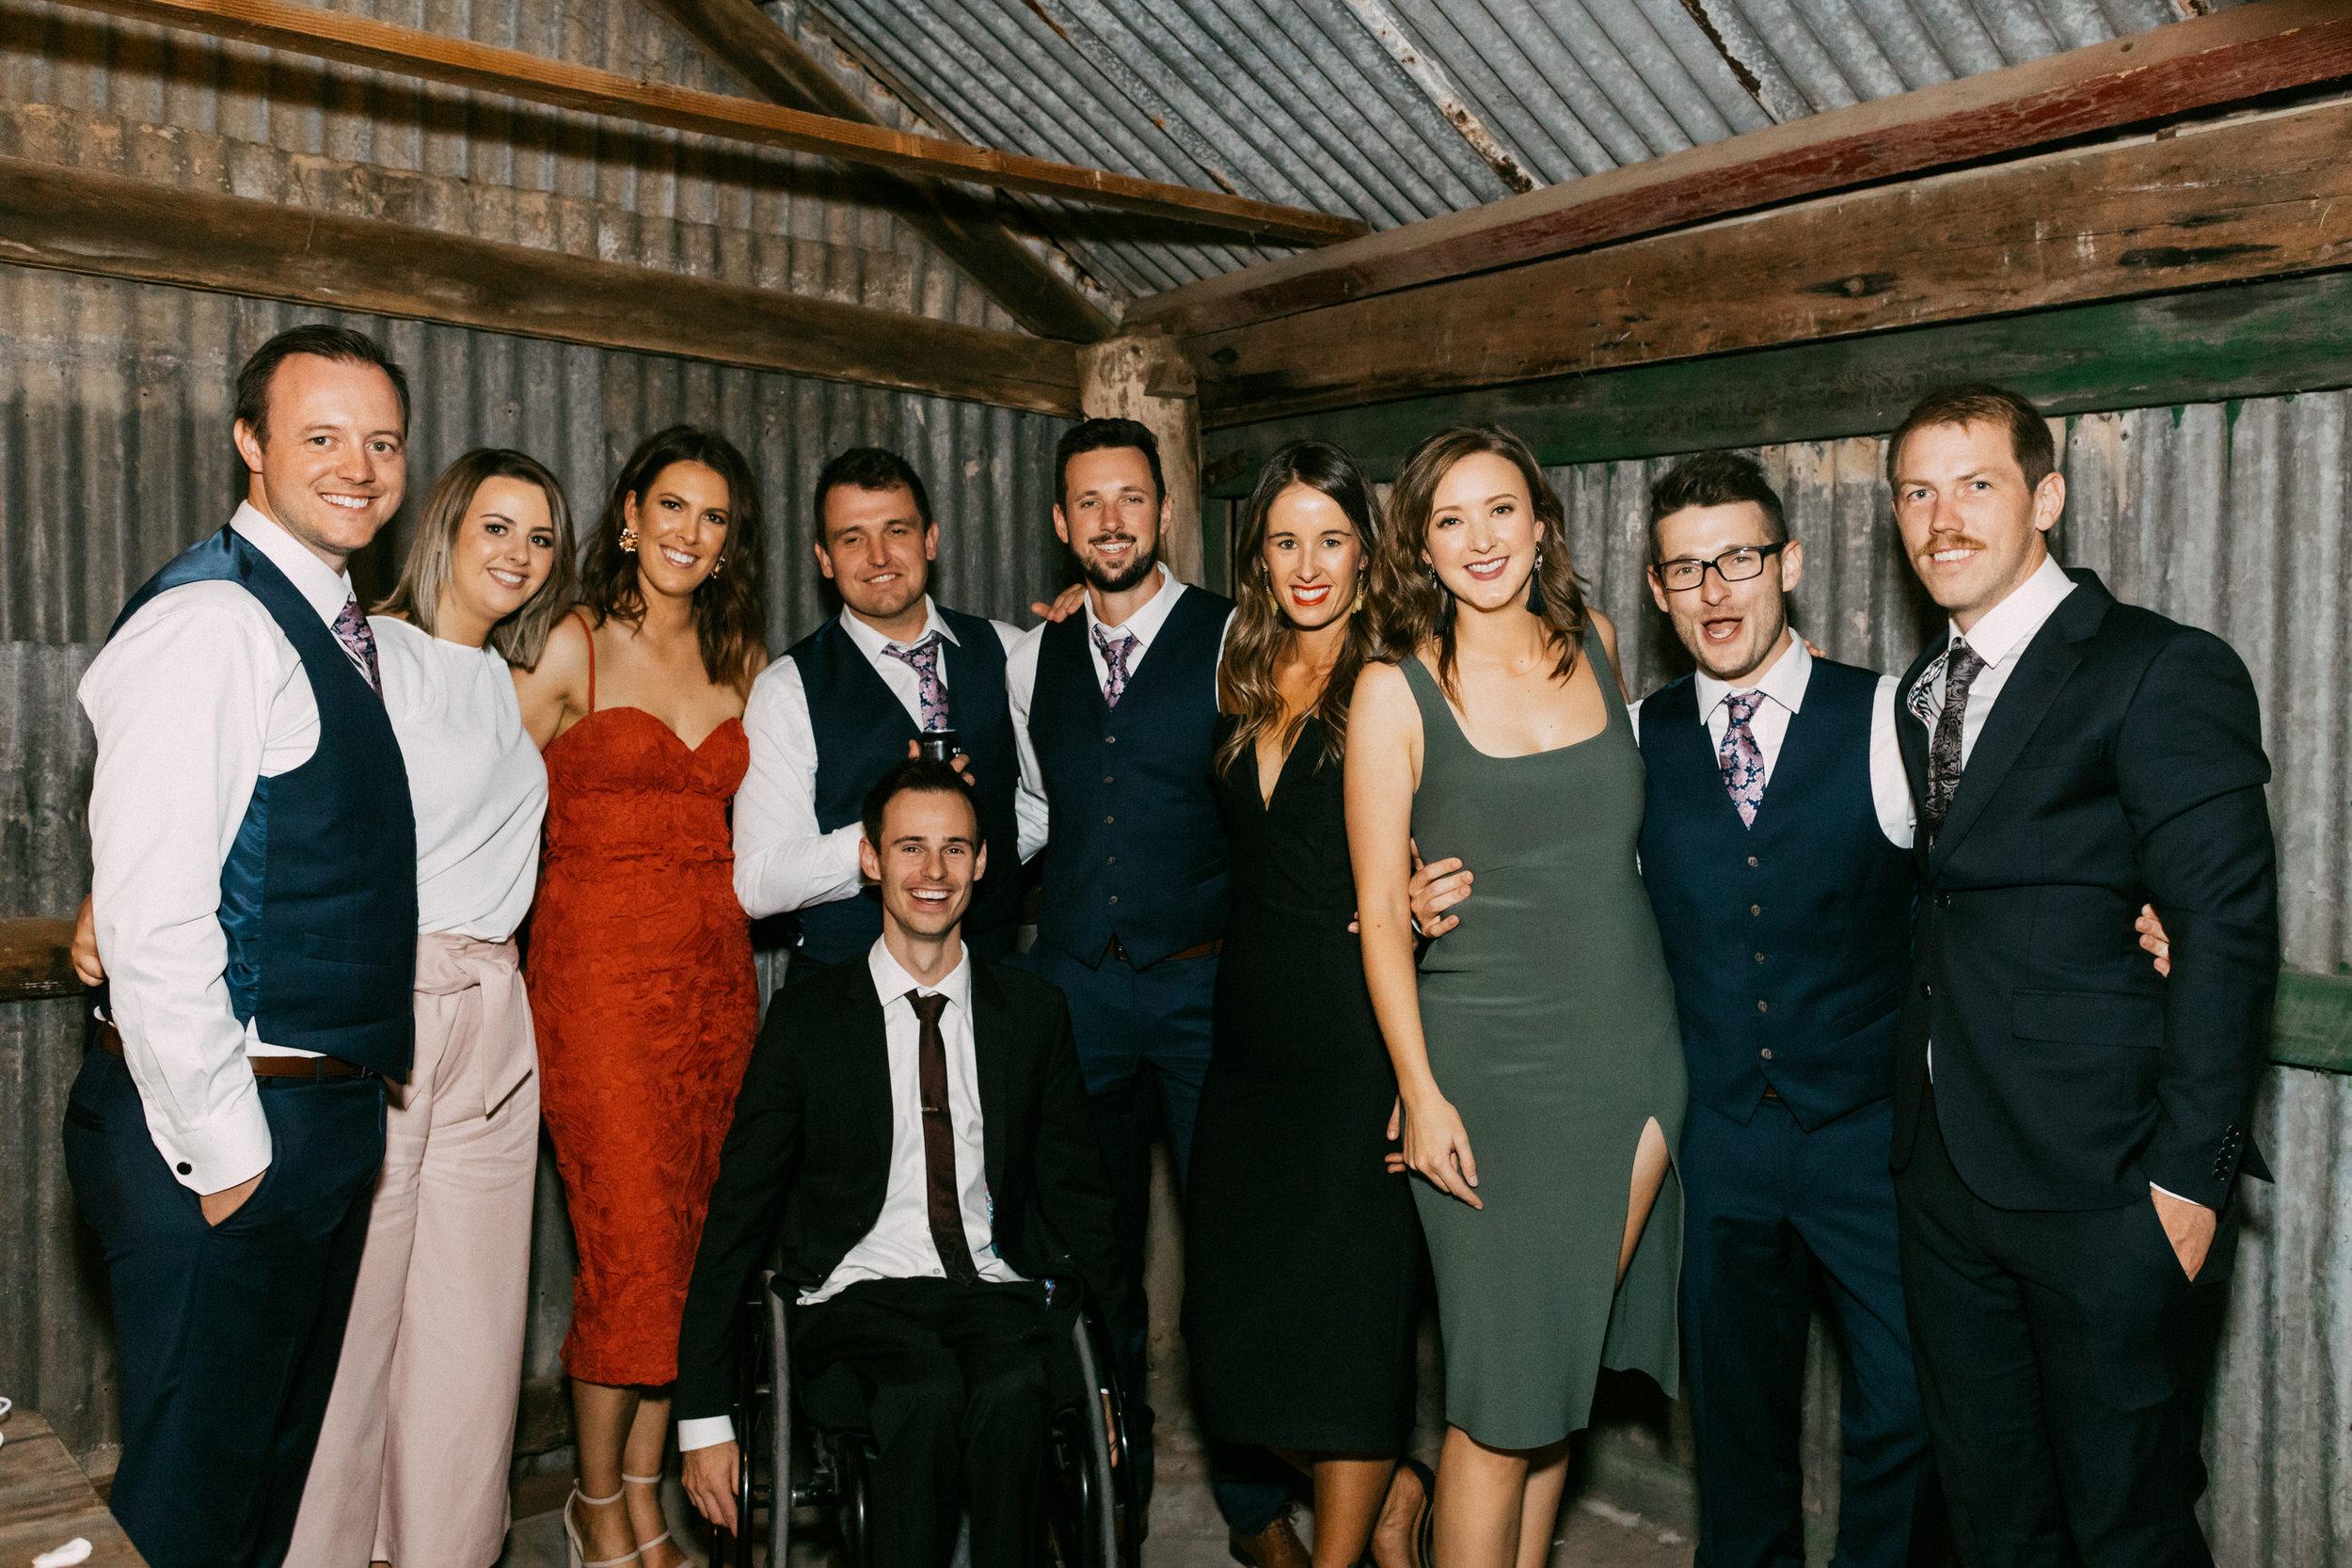 McLaren Vale Adelaide Wedding 172.jpg